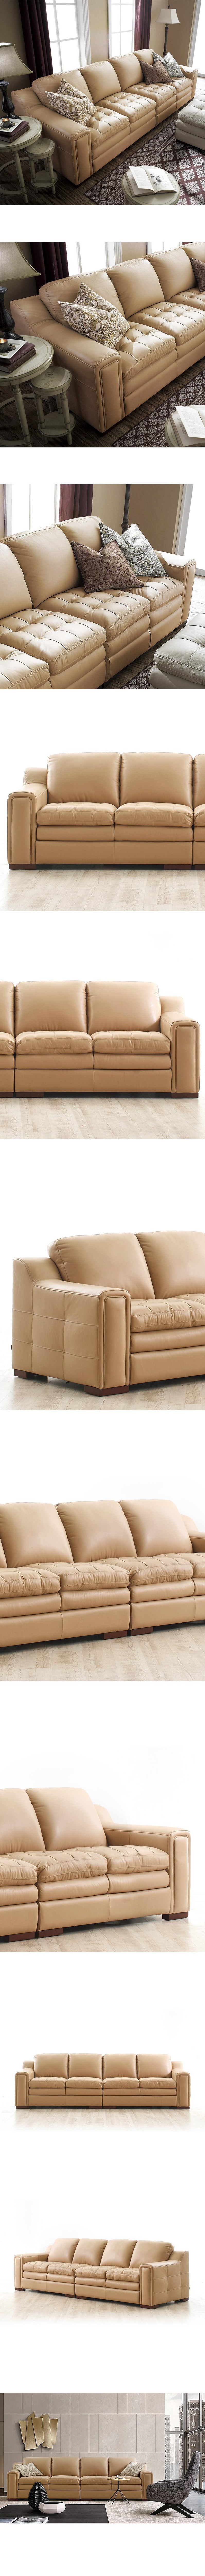 7491-Wheat-Leather-Sofa_191111-3.jpg